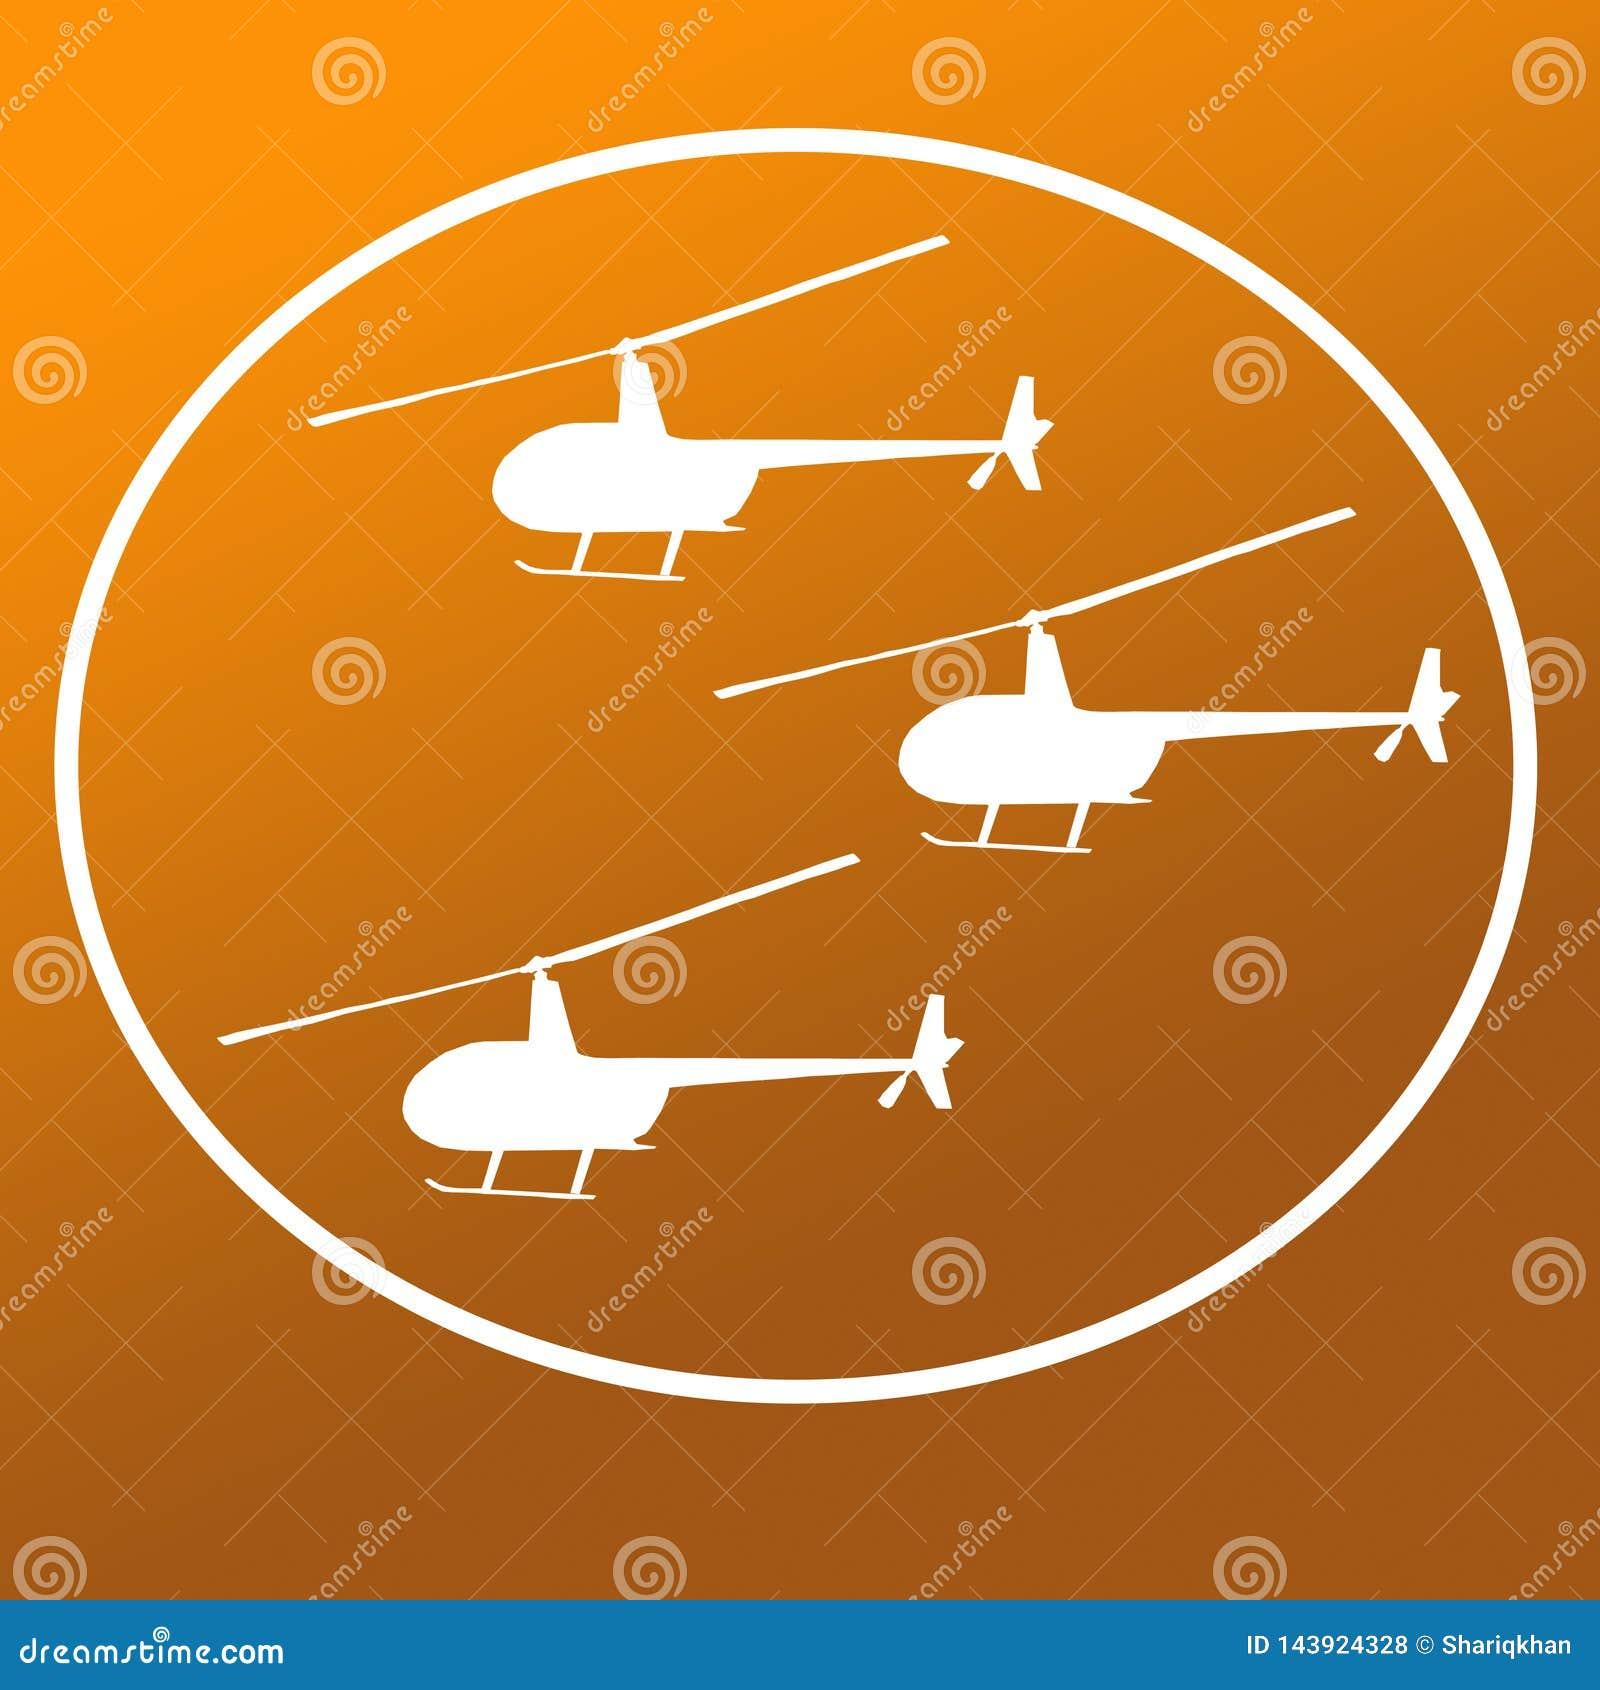 Avbrytarhelikoptrar Logo Banner Background Image